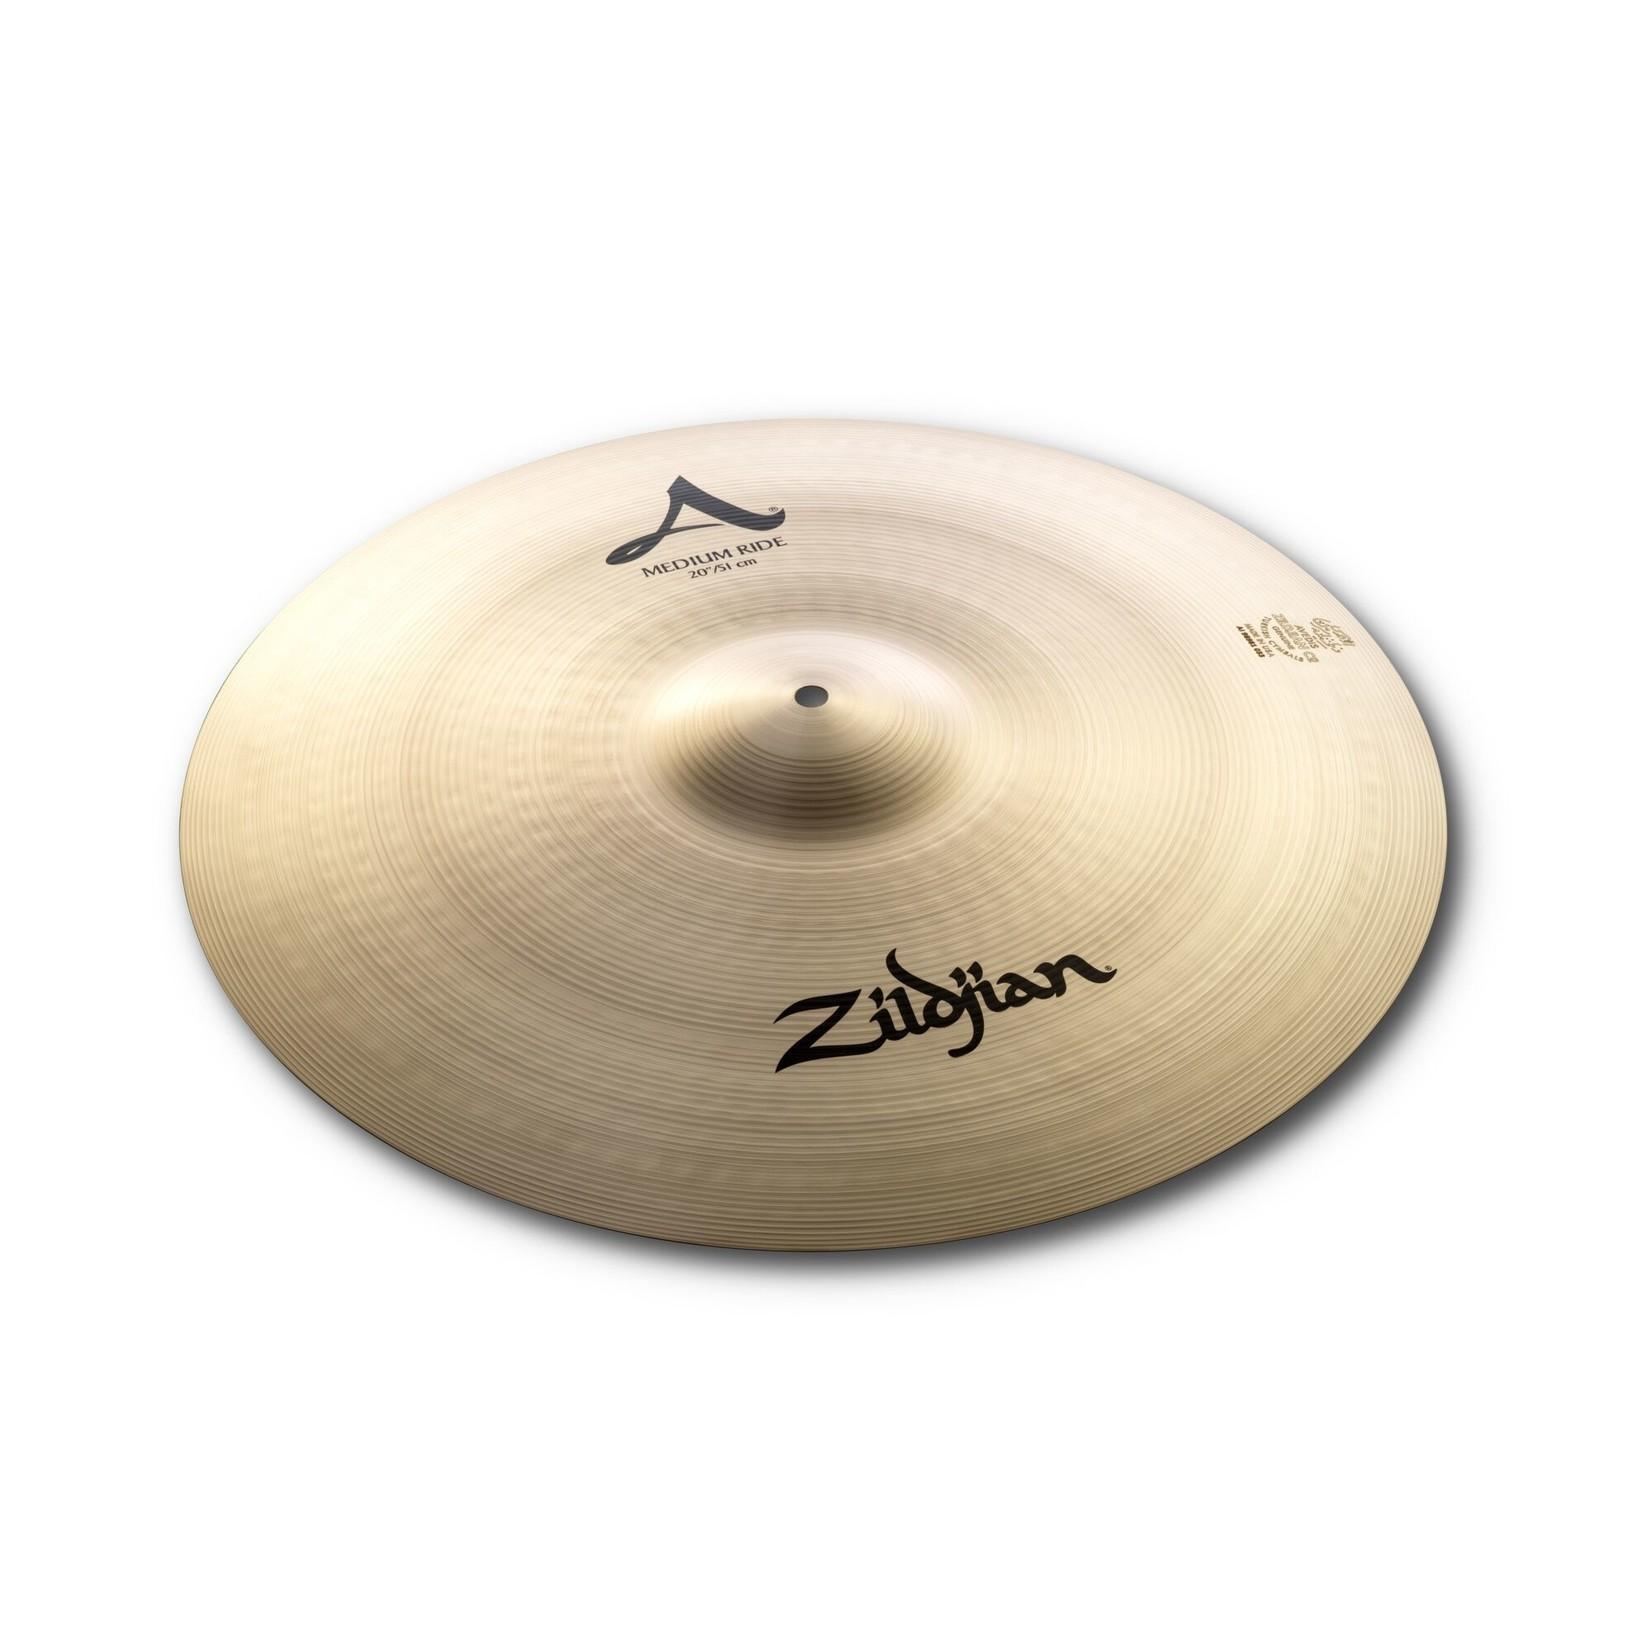 "Zildjian Zildjian 20"" A Zildjian Medium Ride"